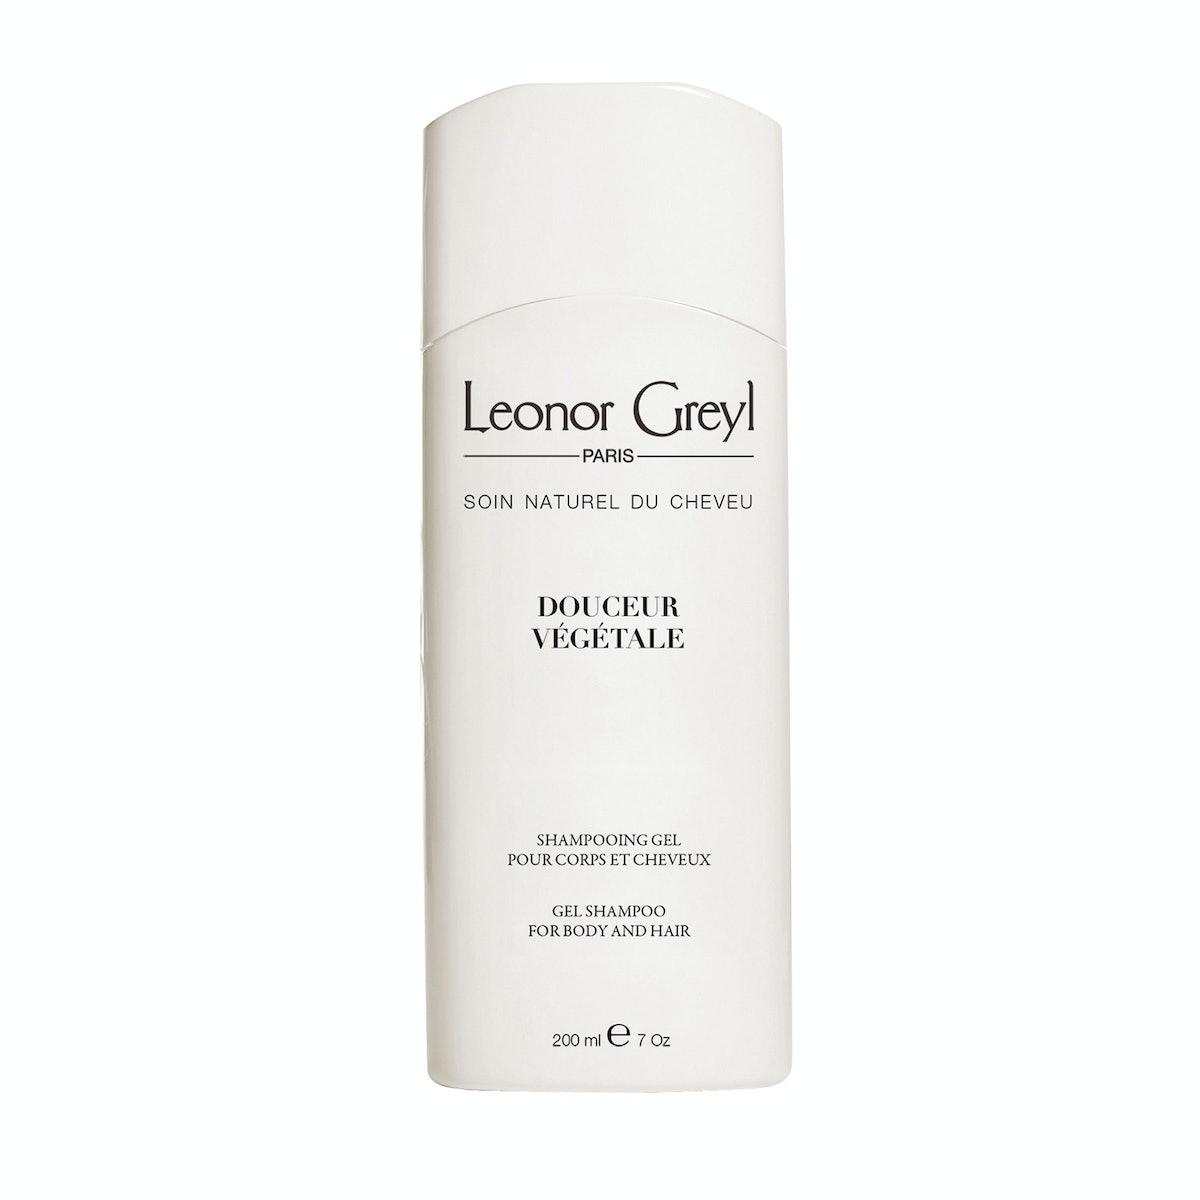 Leonor Greyl Paris Douceur Vegetale Dual-Purpose Shampoo for Hair and Body